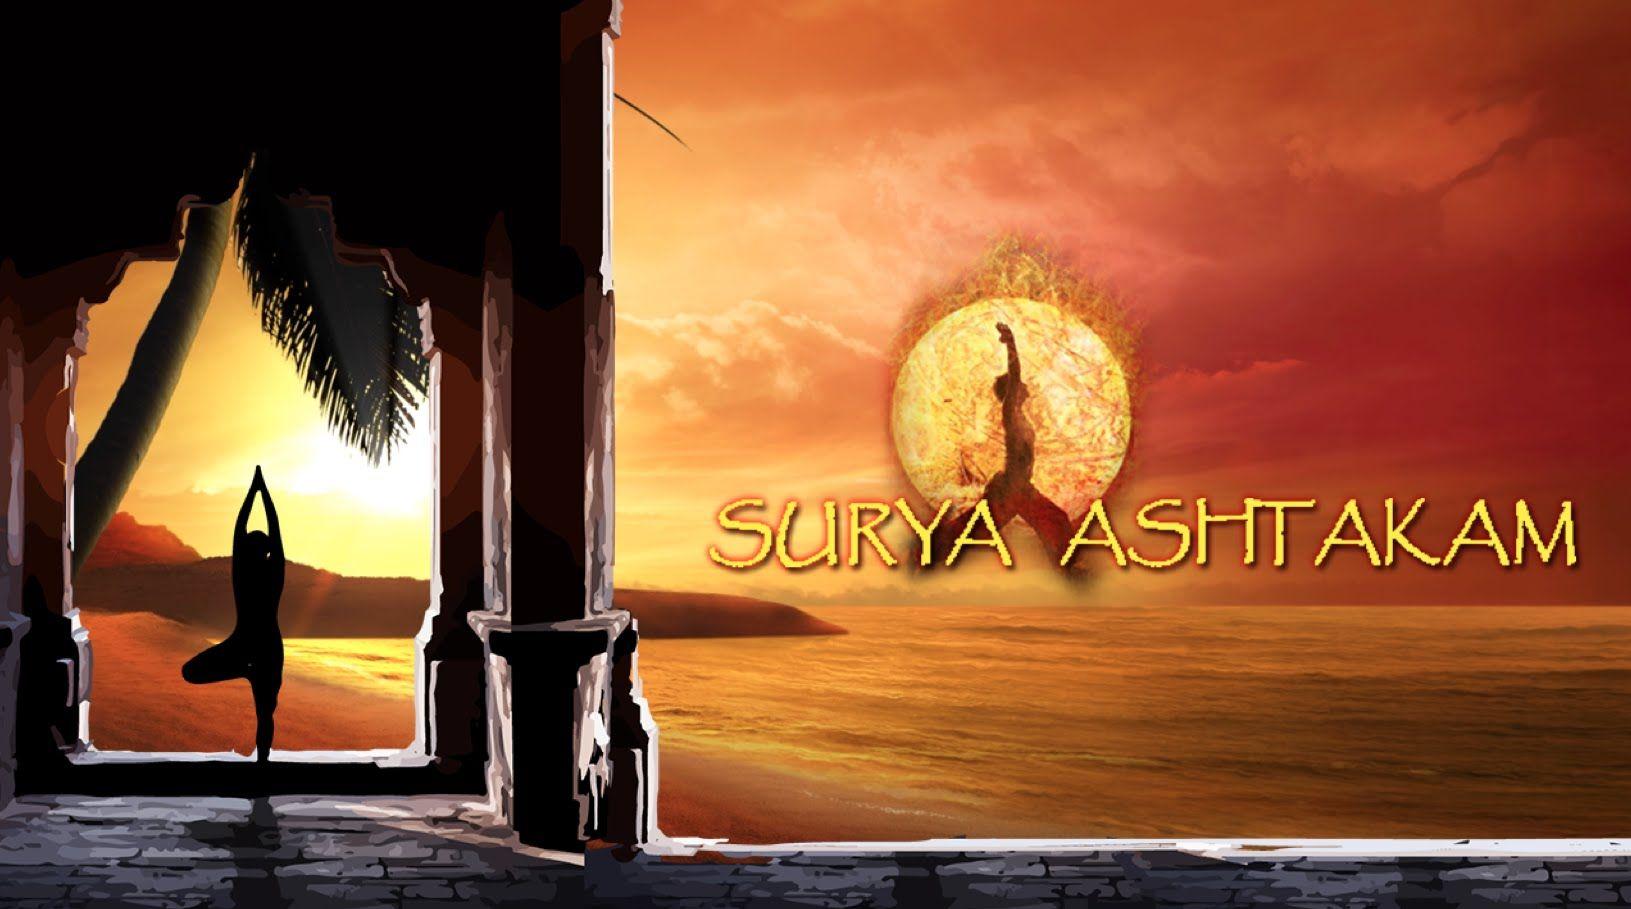 Surya Ashtakam With Lyrics